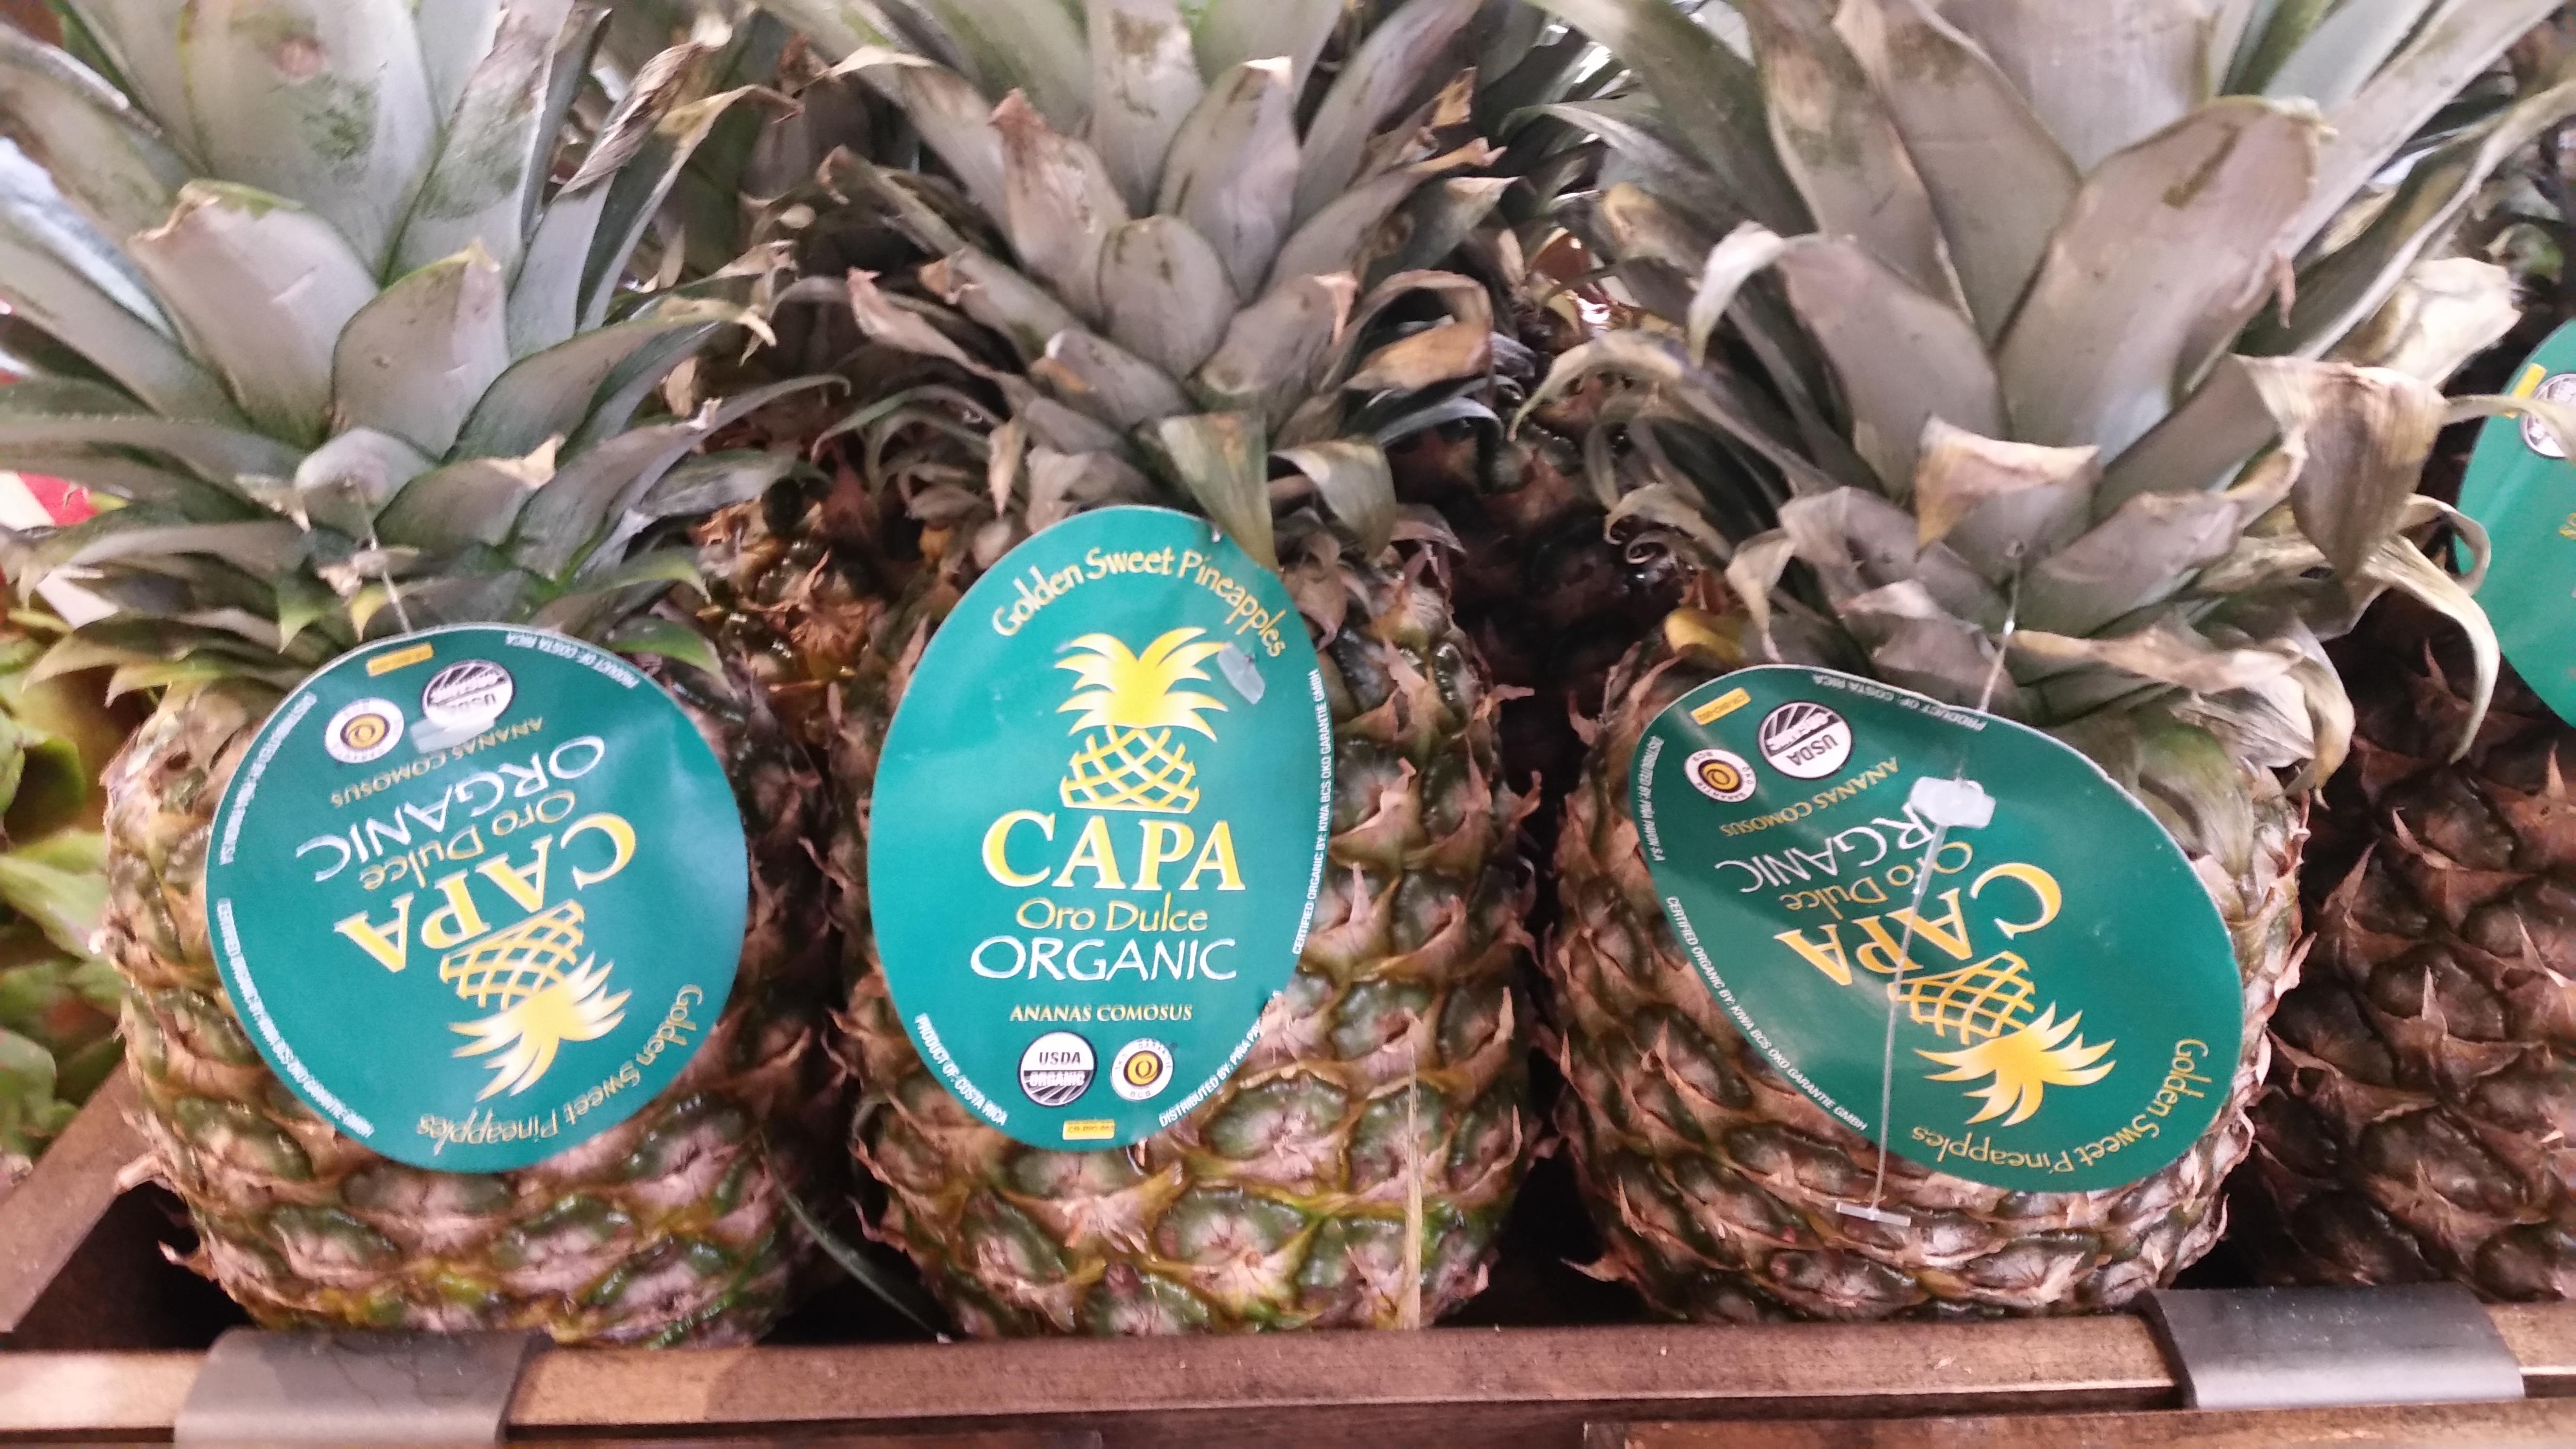 Capa Oro Dulce organic pineapples from Costa Rica.